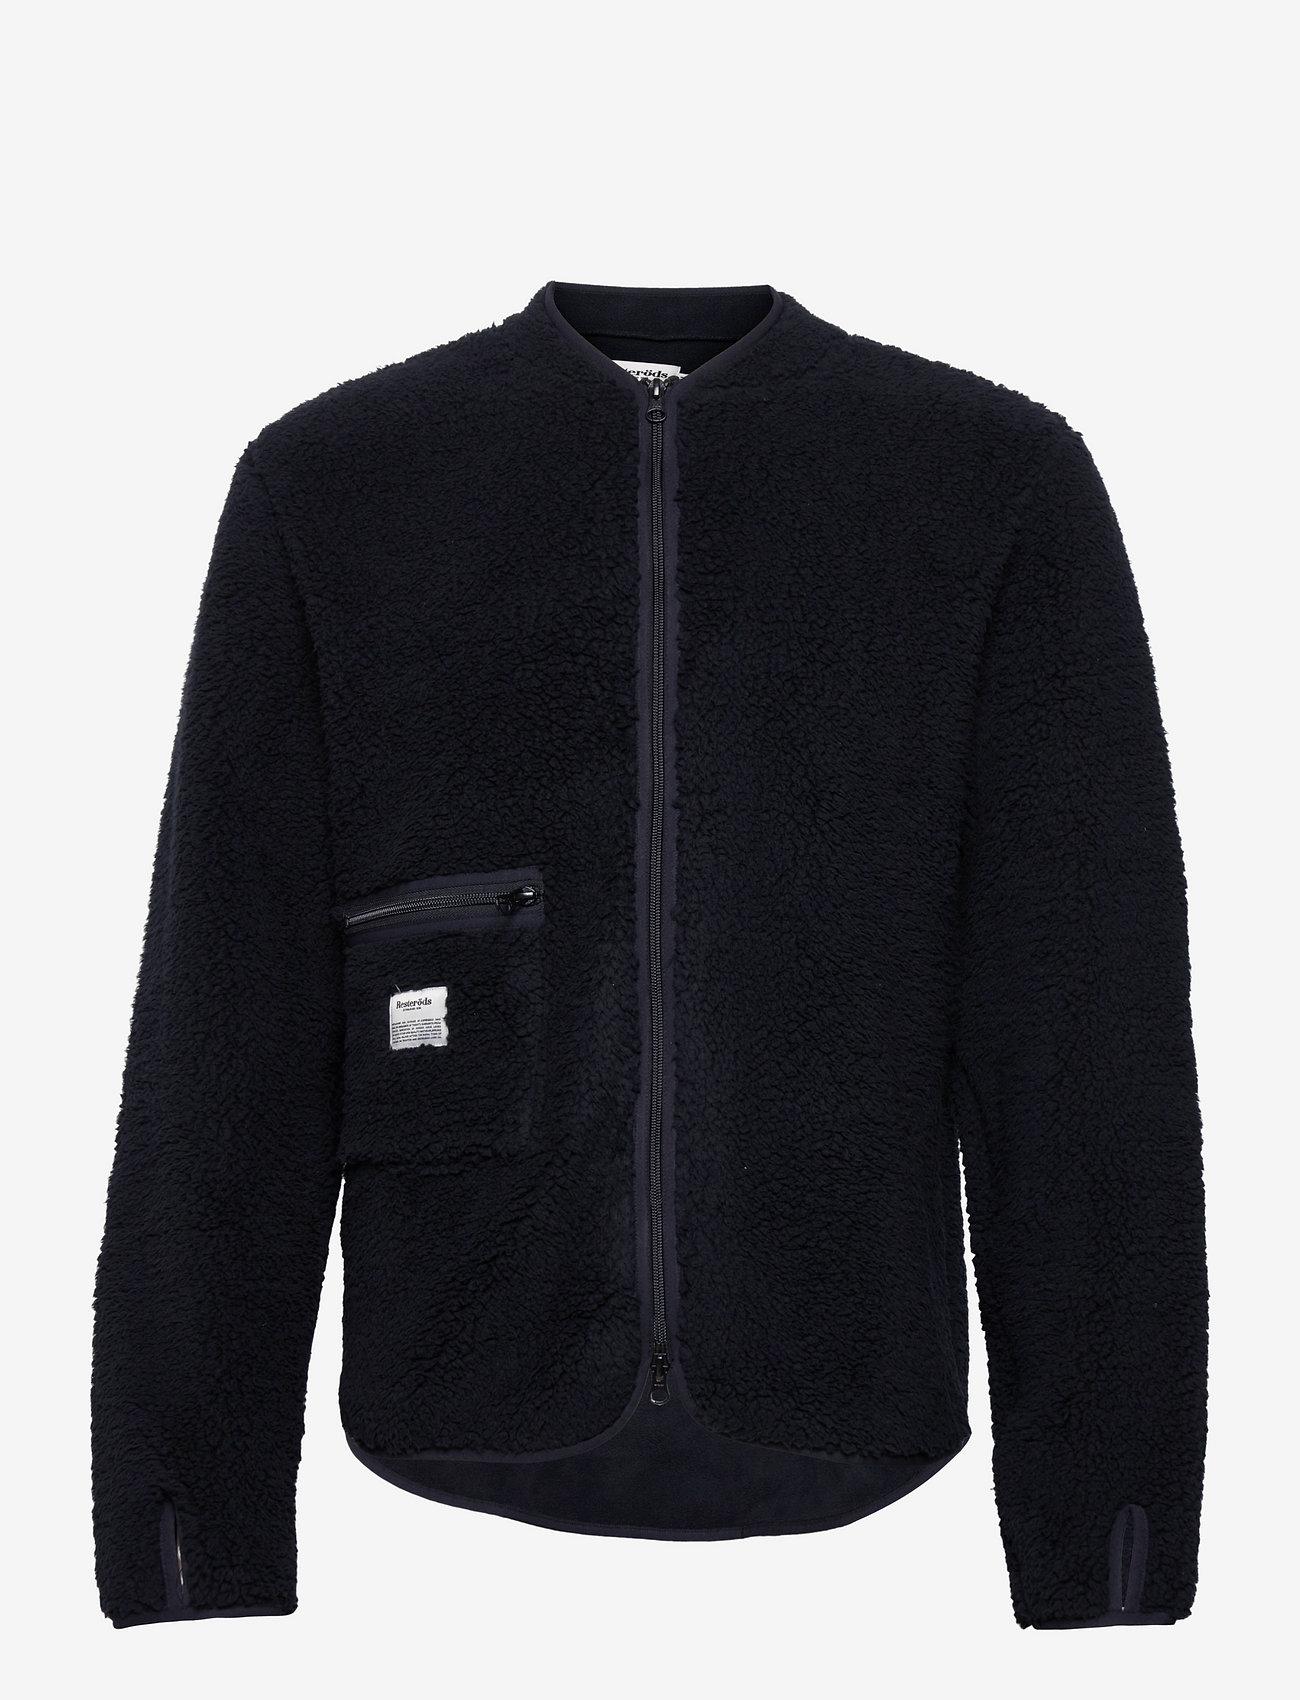 Resteröds - Original Fleece Jacket Recycle - podstawowe bluzy - svart - 0